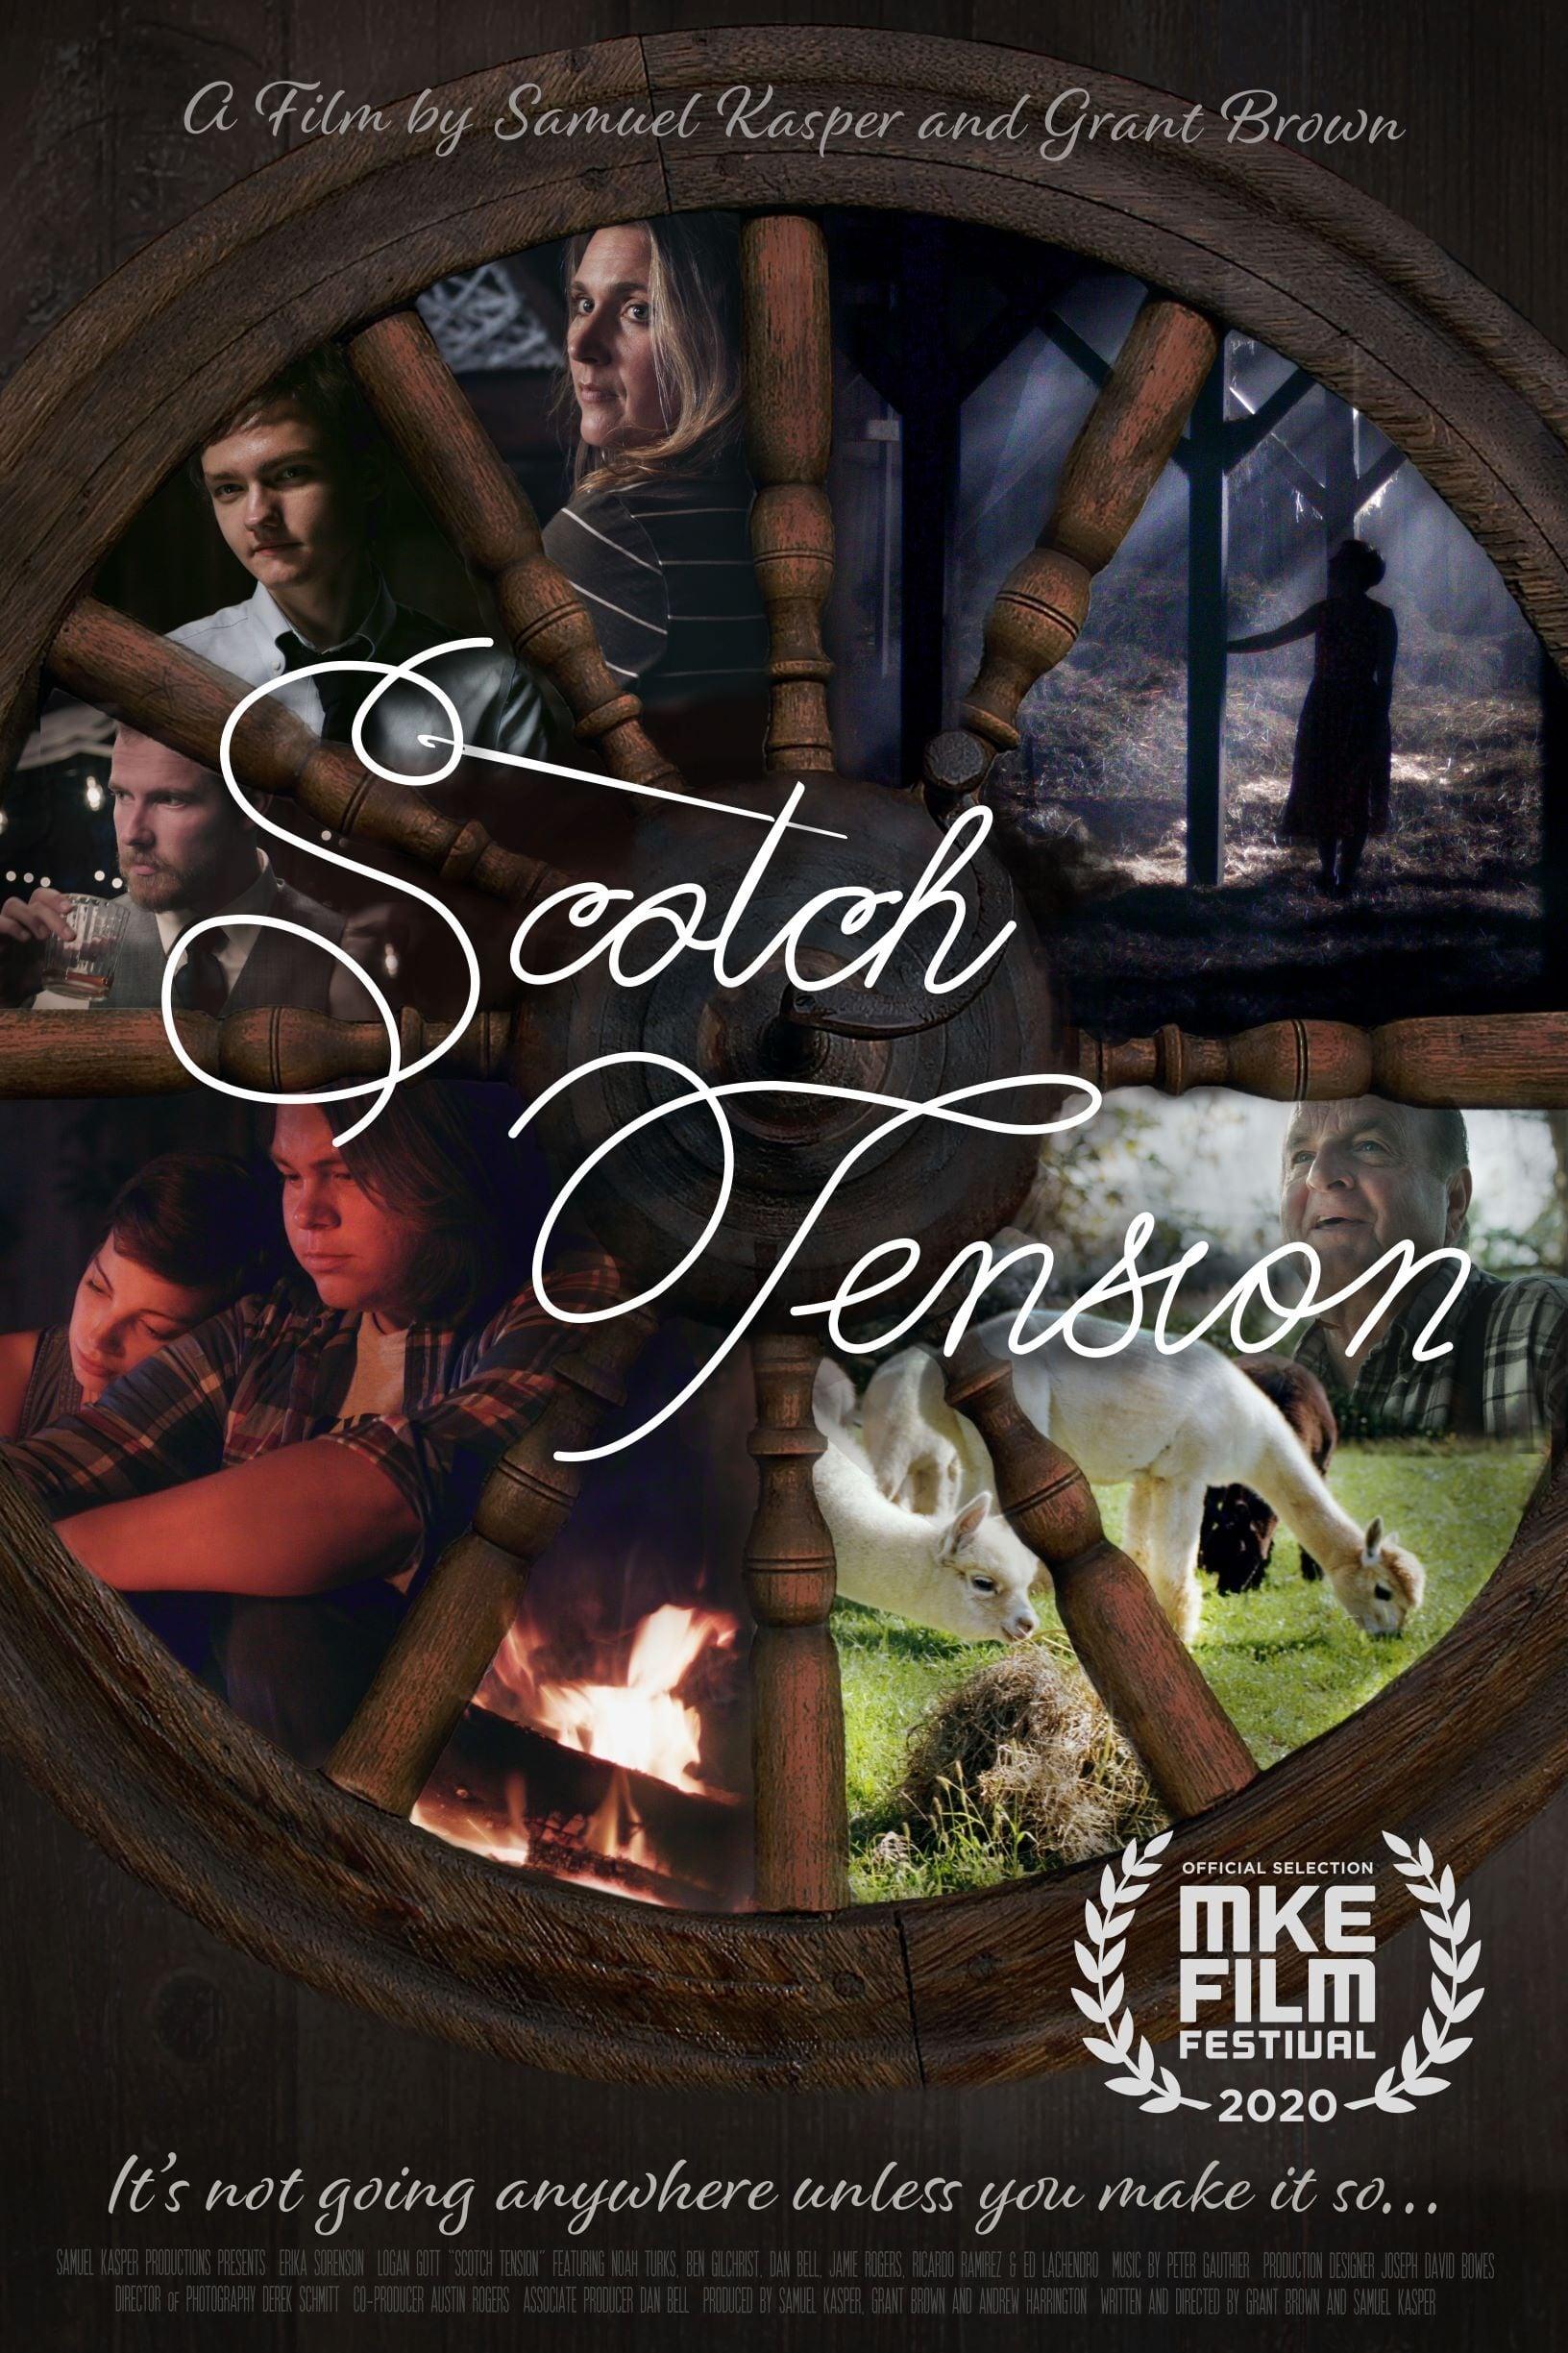 Scotch Tension